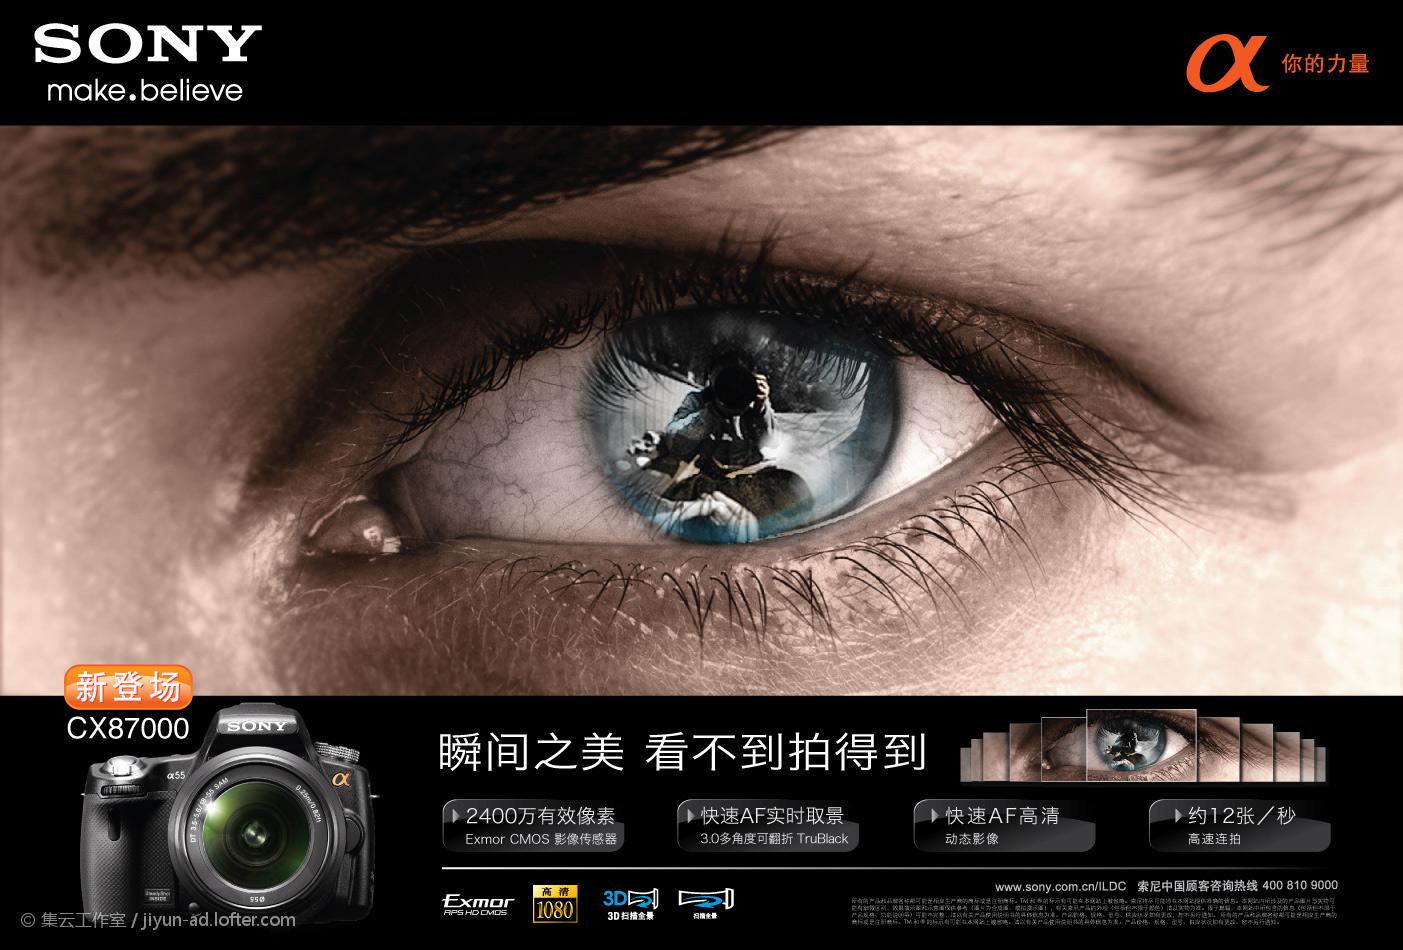 sony广告推广画面